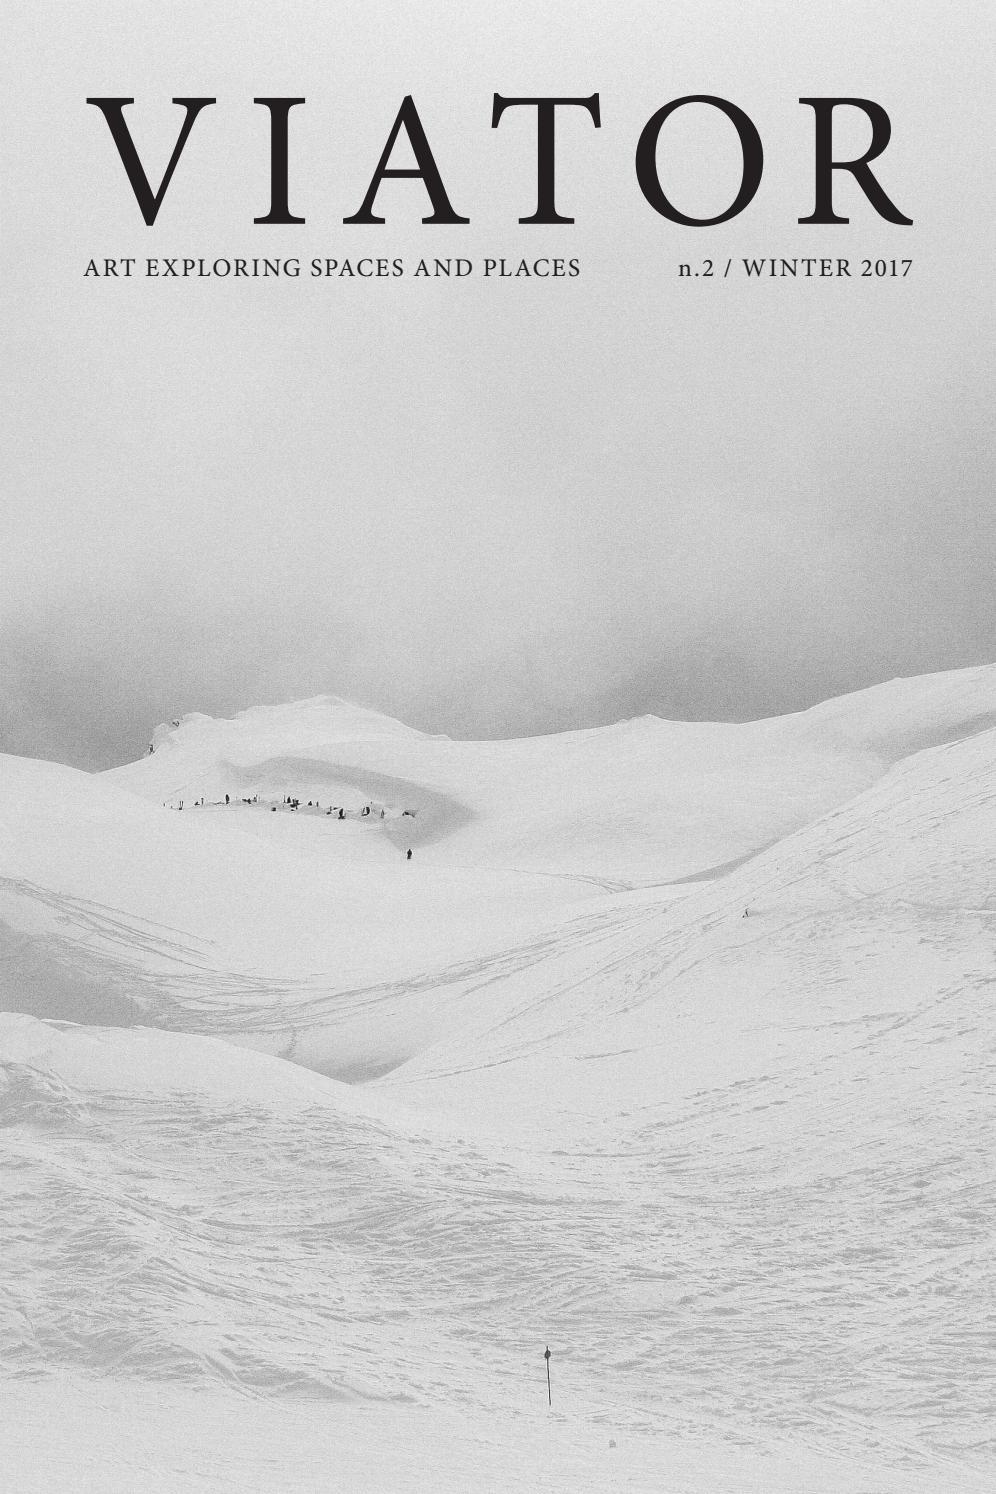 VIATOR n. 2 Winter 2017 by Viator Project - issuu